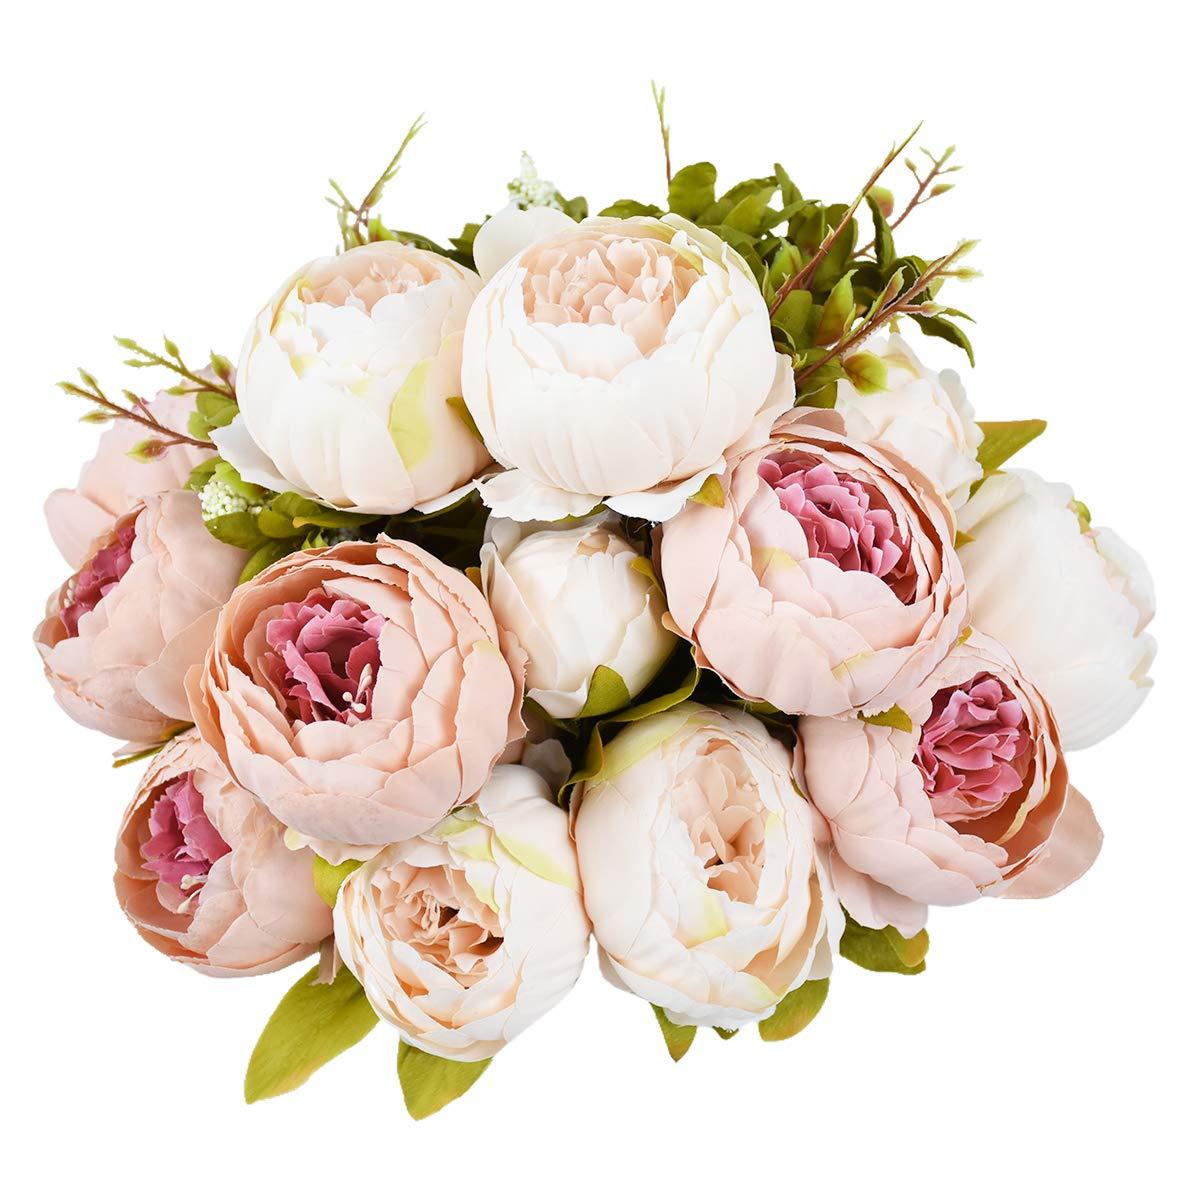 Sunm boutique 2 Pcs Artificial Peony Silk Flower Leaf Home Bridal Wedding Party Festival Bar Decor (Pink, 2 Pcs) by Sunm boutique